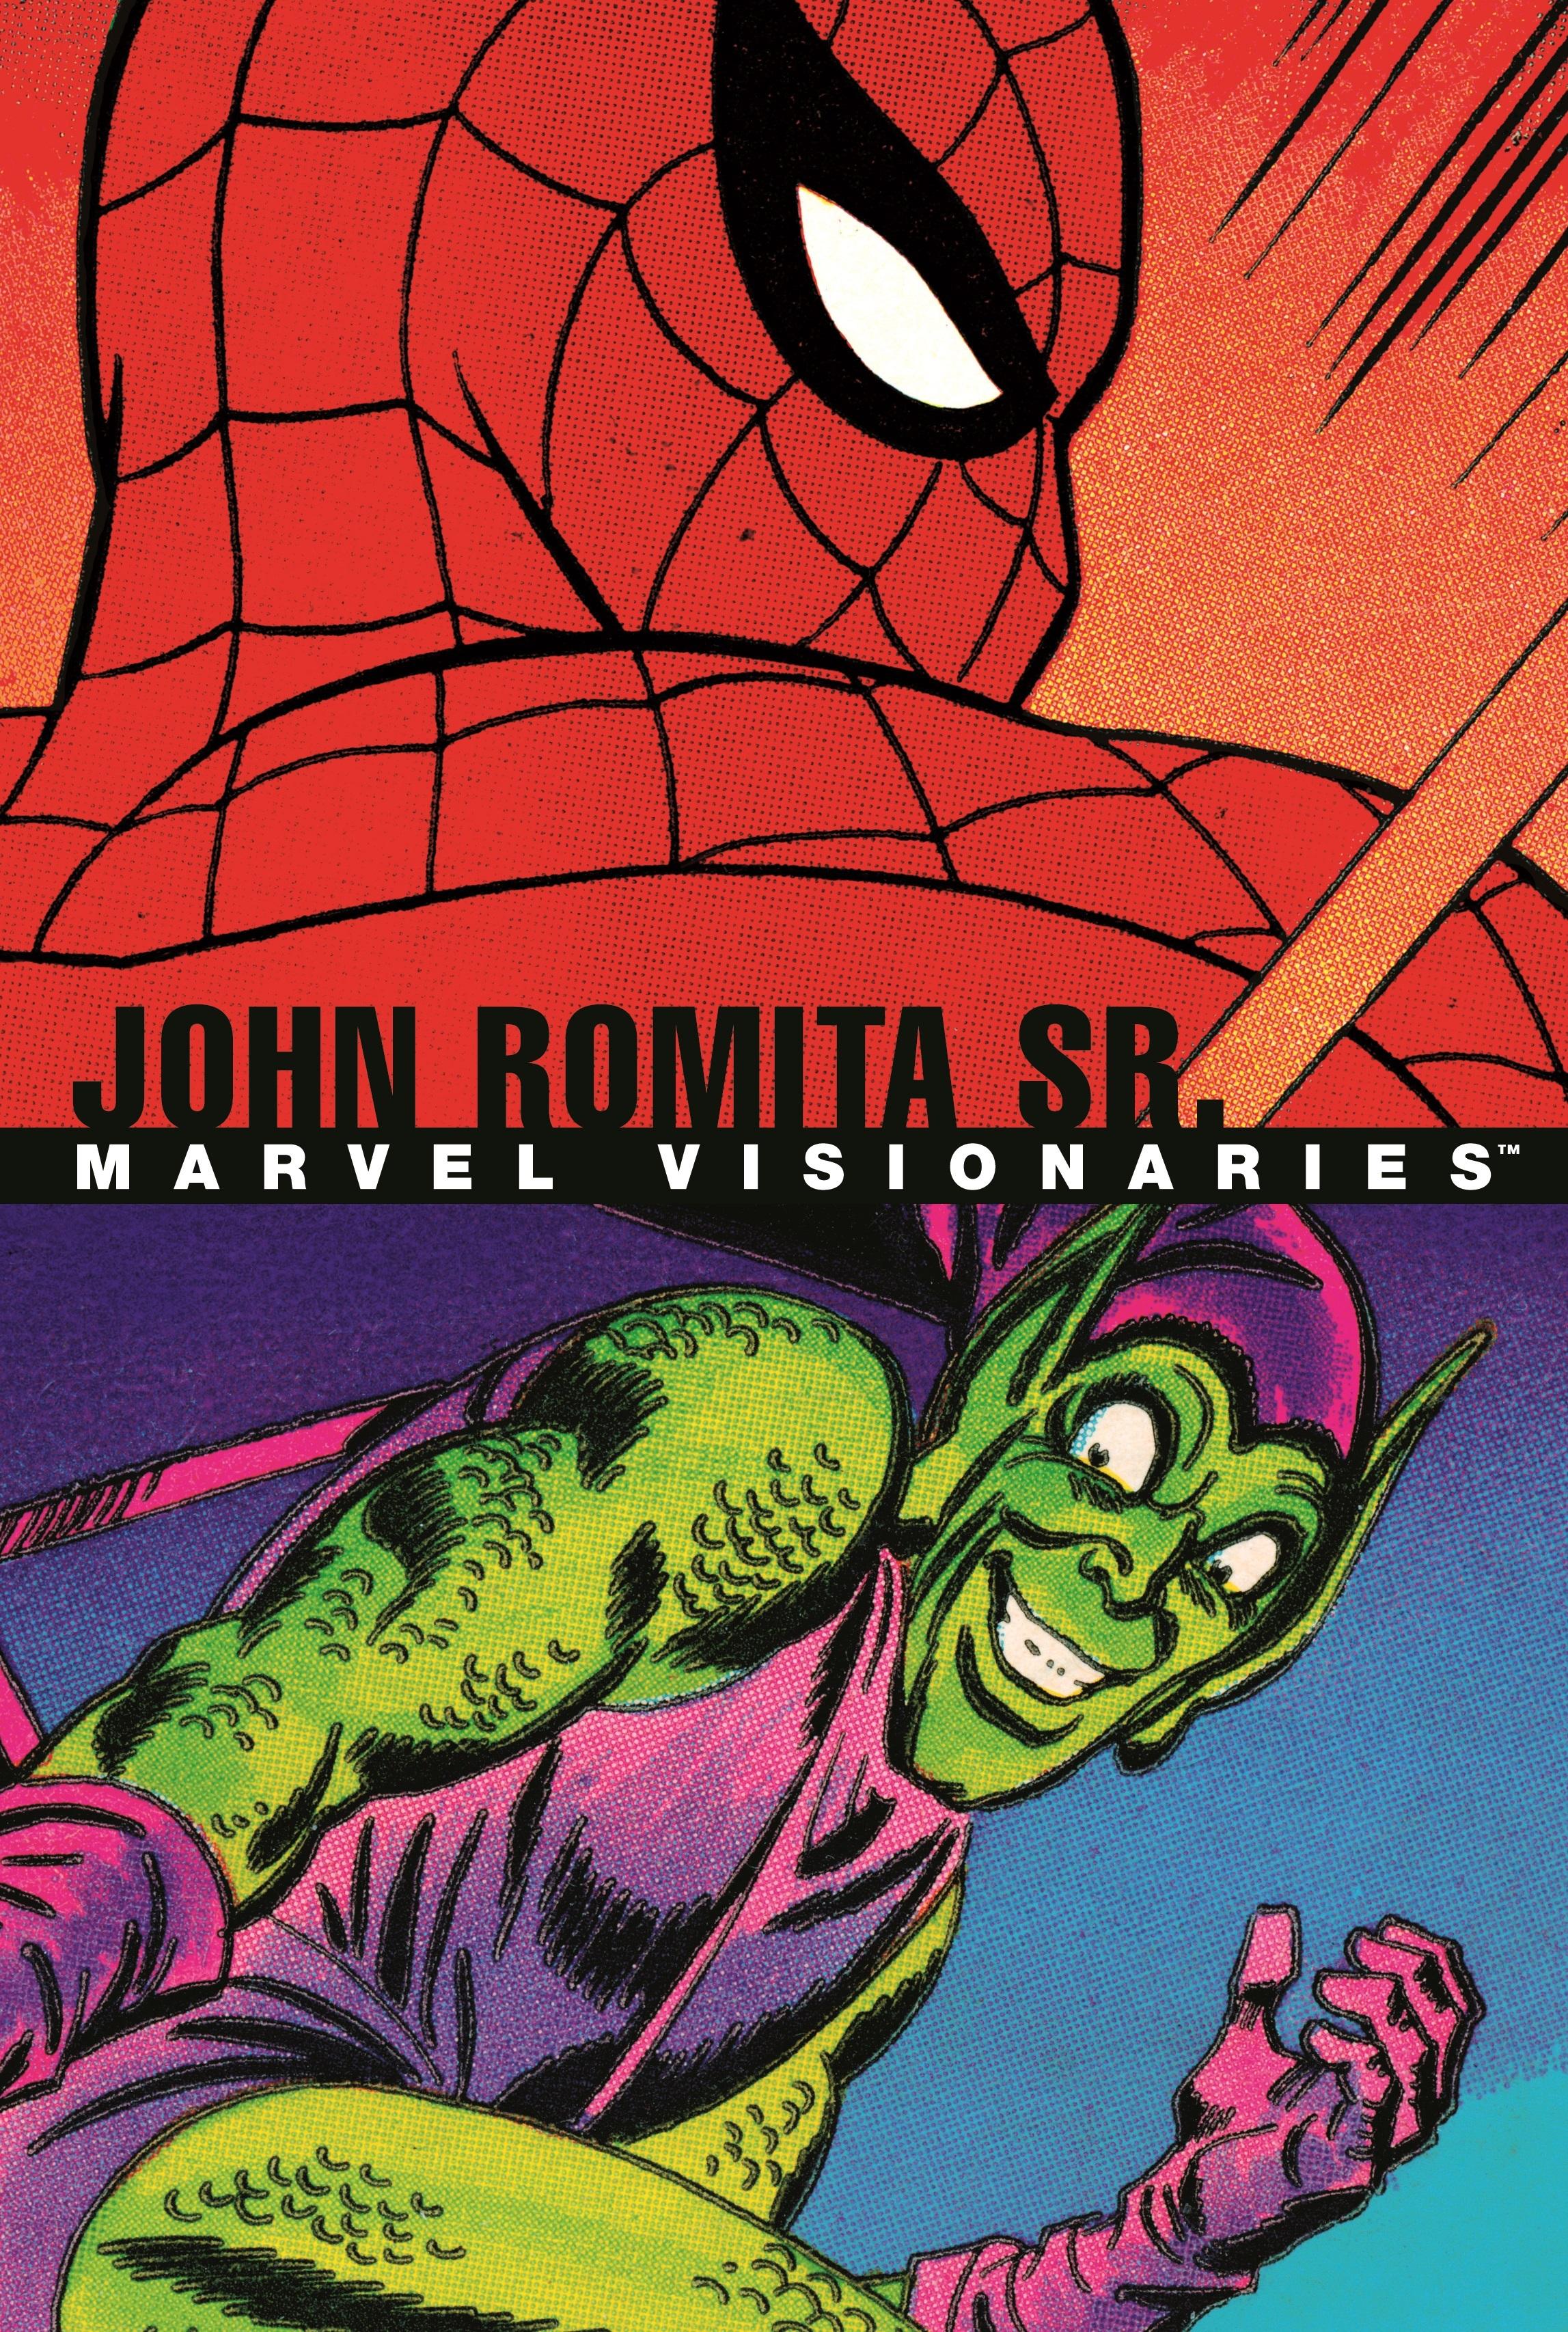 Marvel Visionaries: John Romita Sr. (Hardcover)